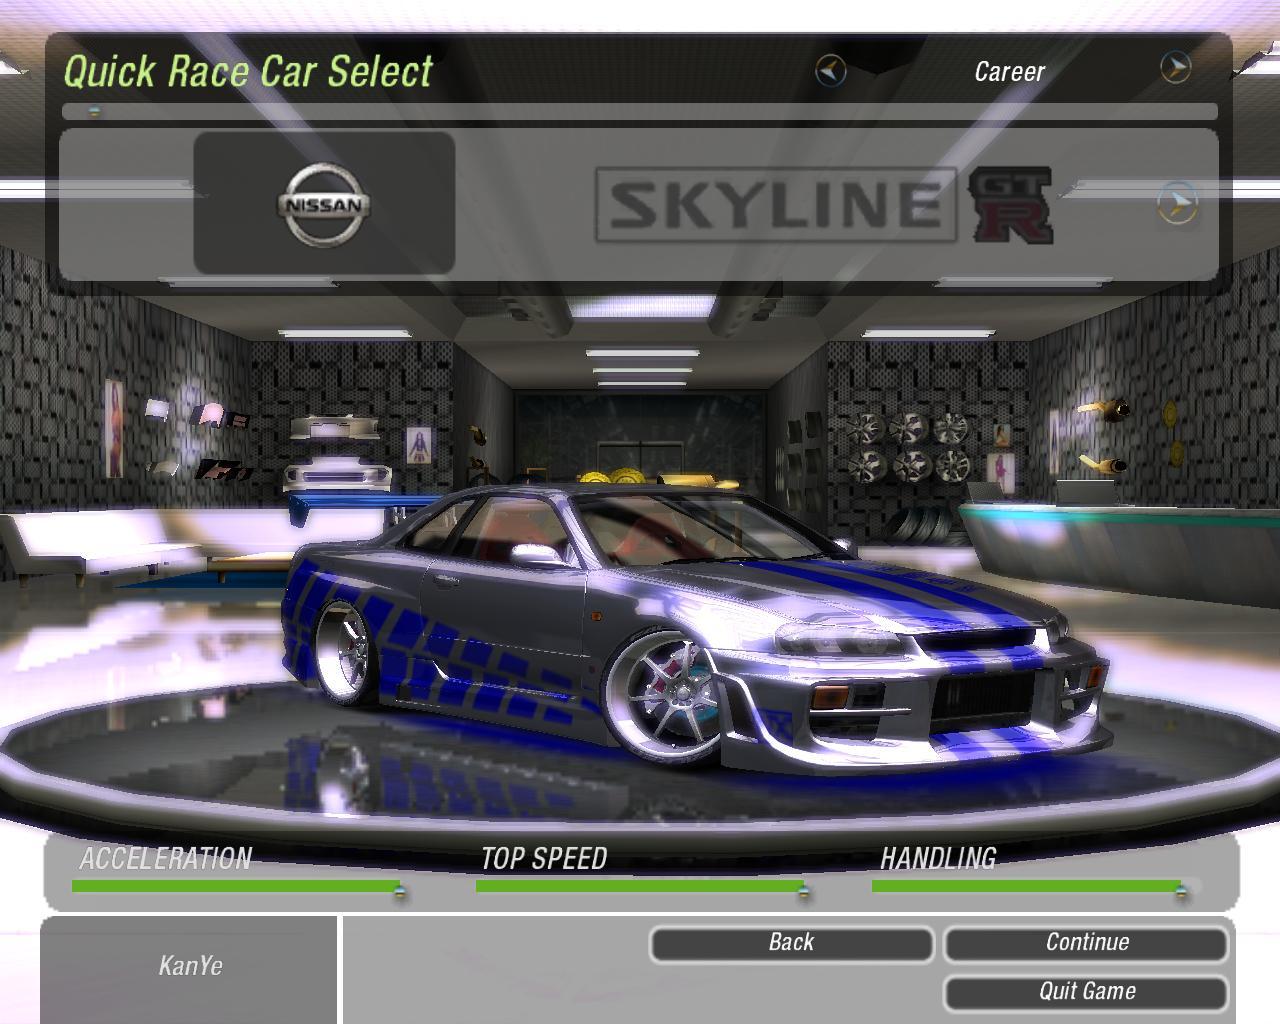 Car games 2 fast 2 furious casino slot play coupons